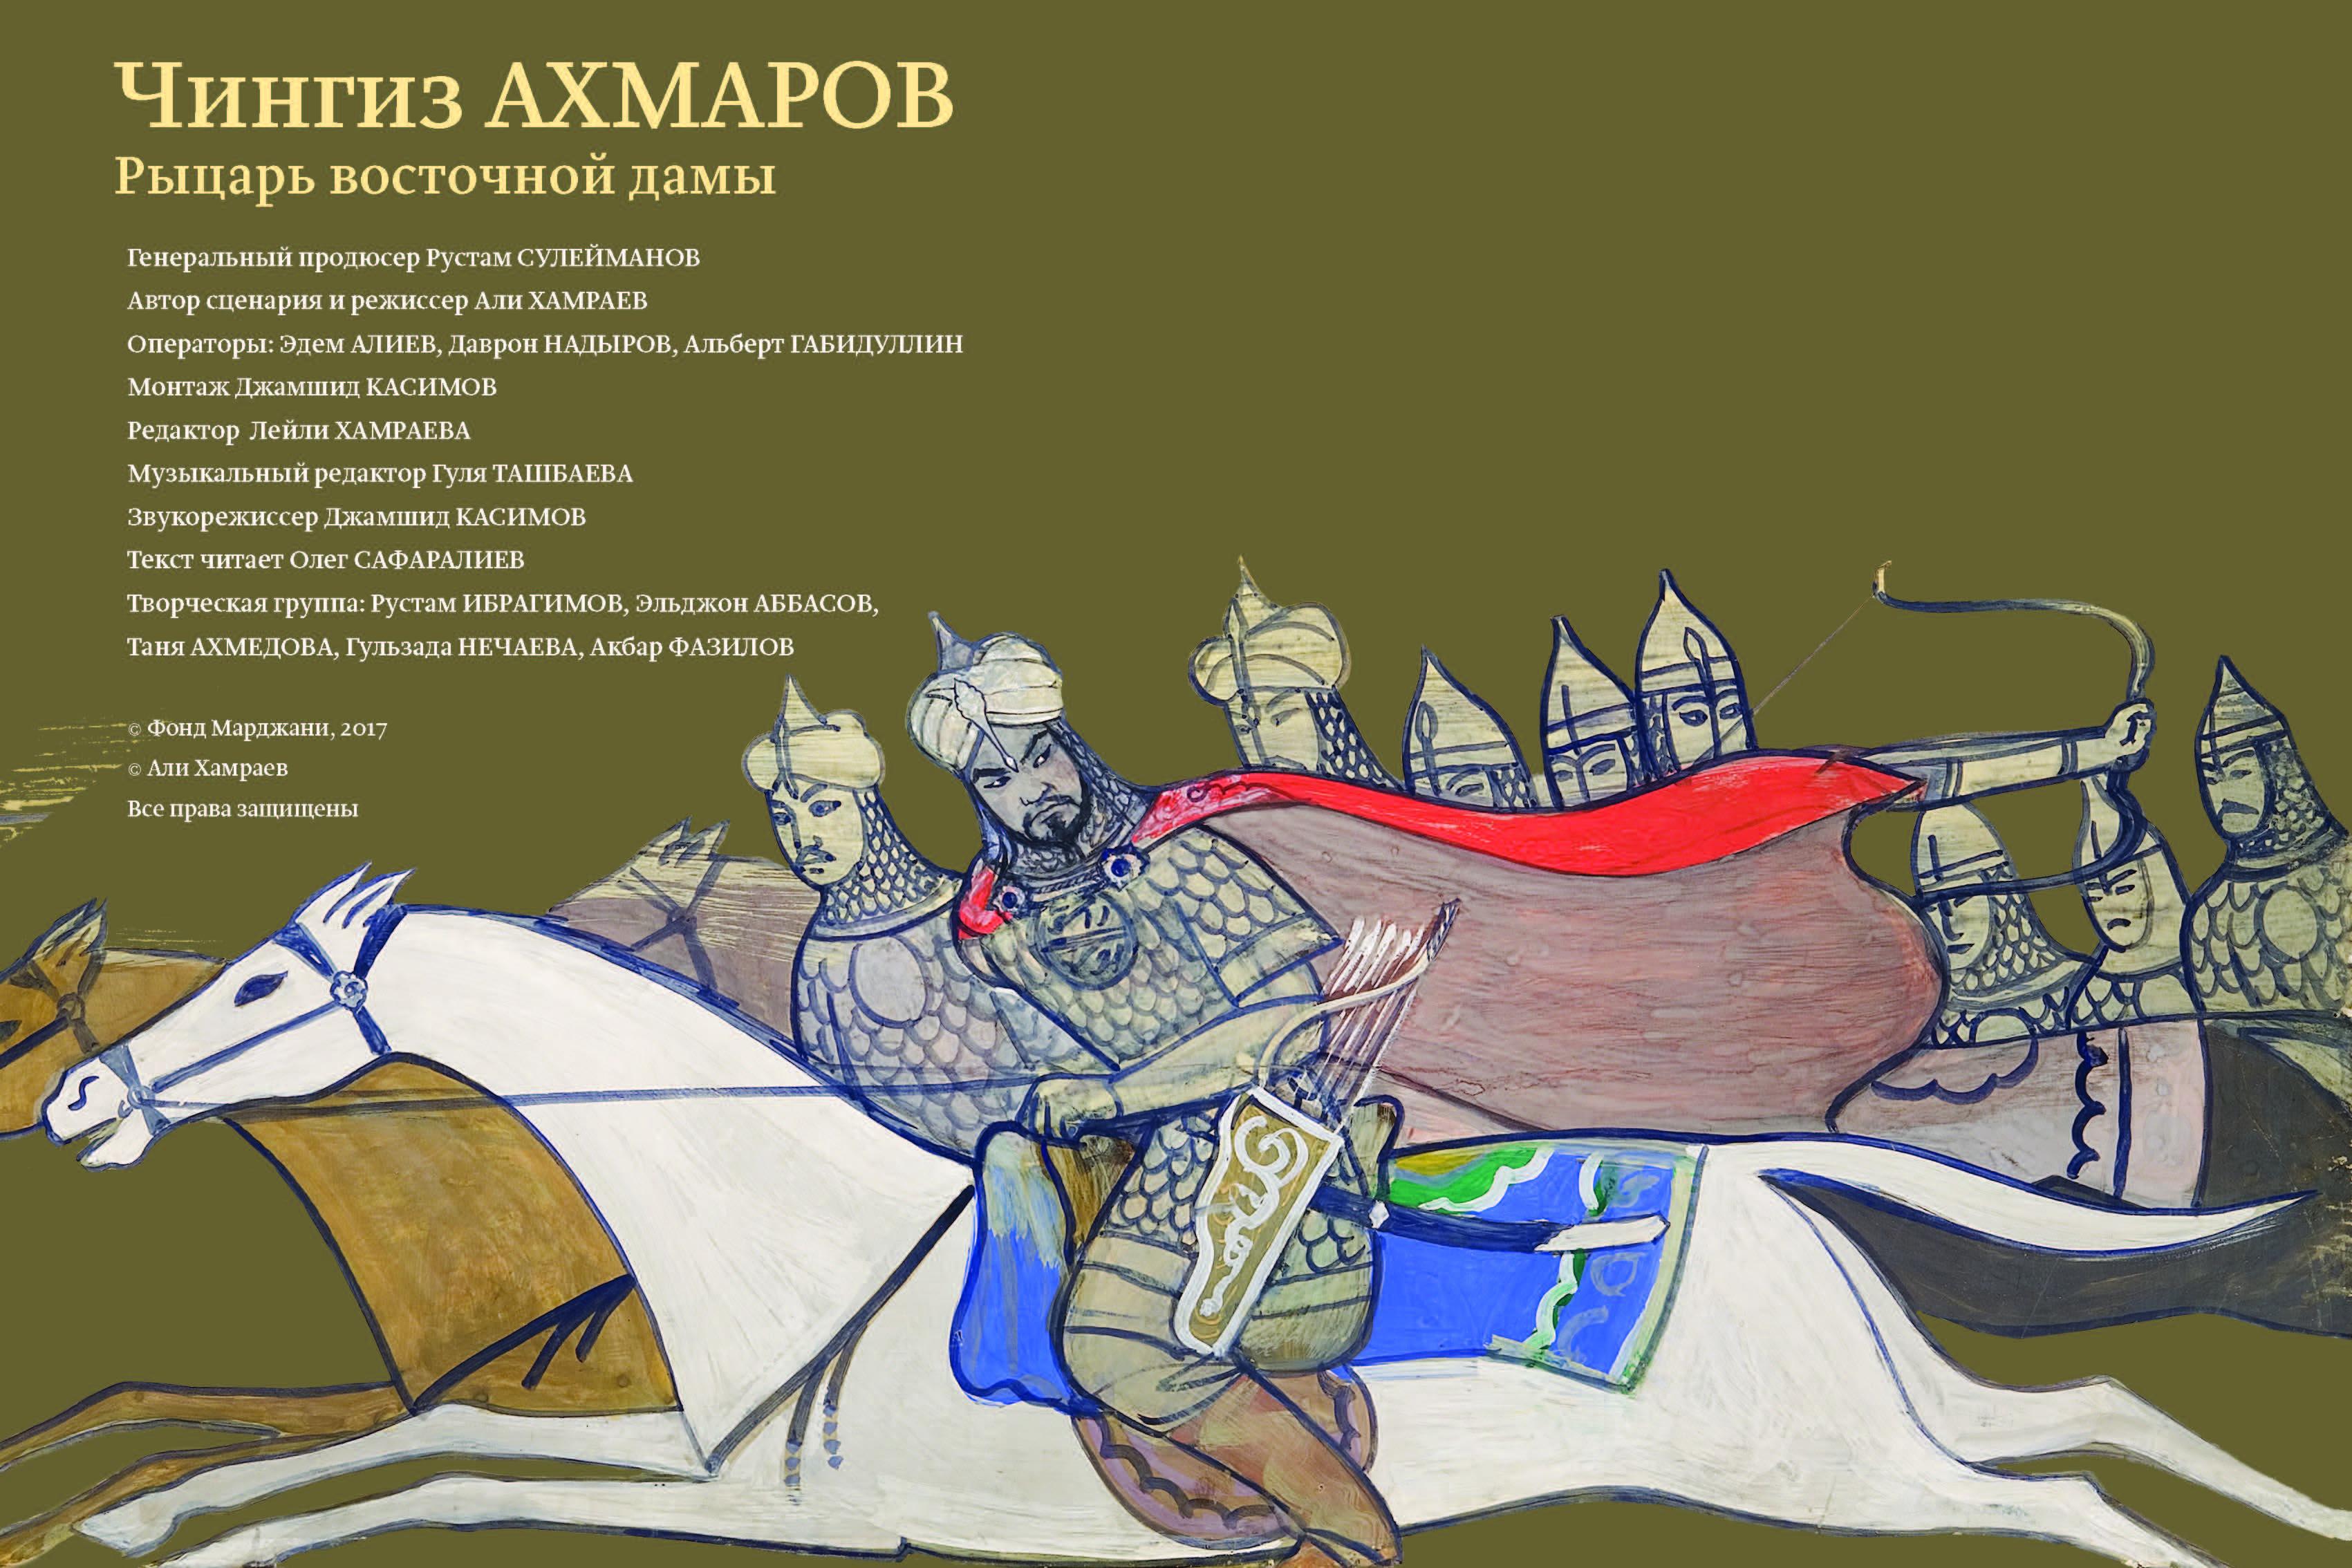 Chingiz_Ahmarov_1_Страница_3.jpg